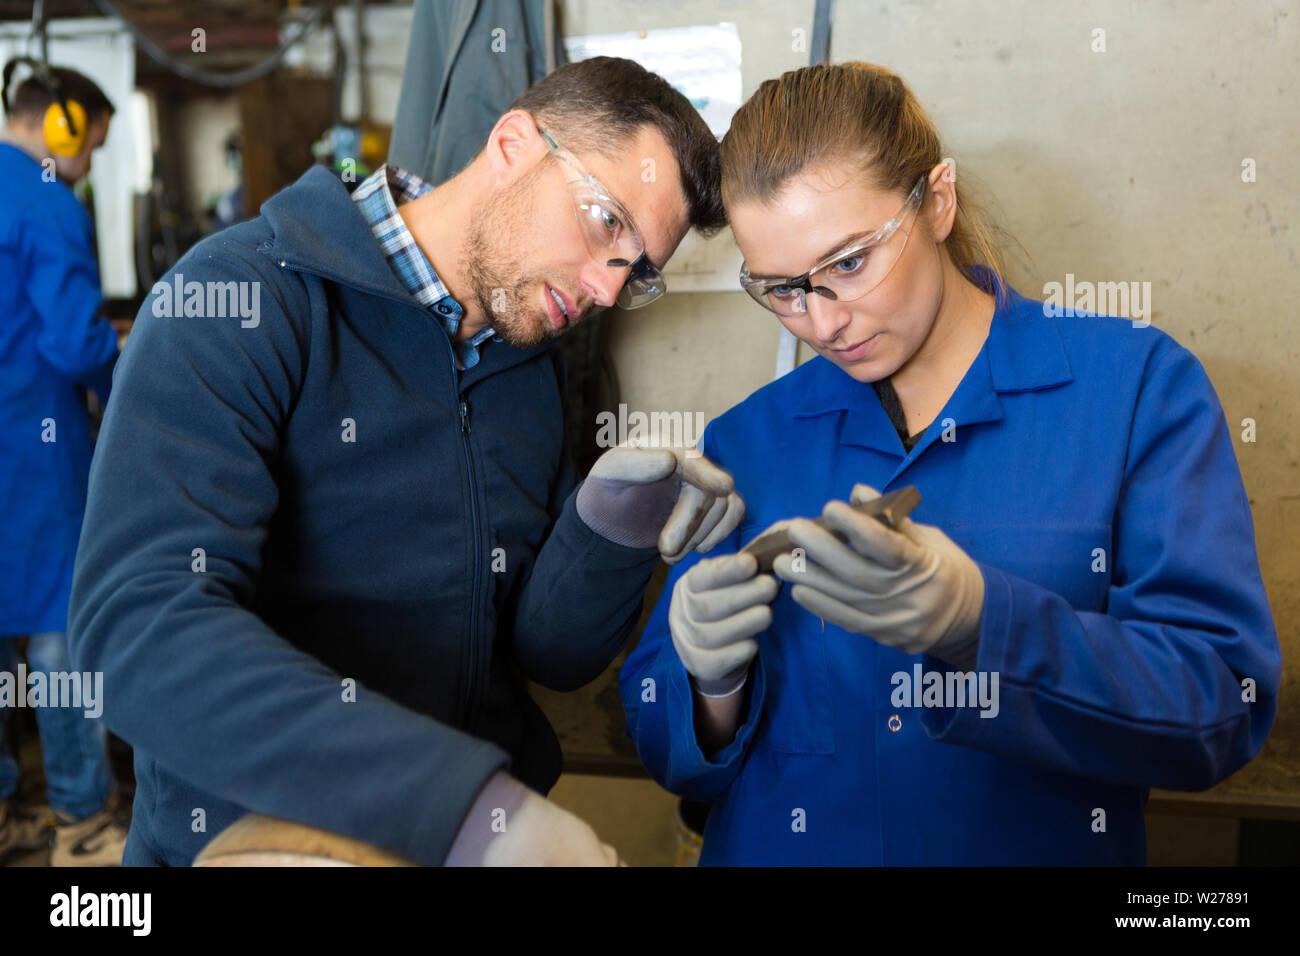 man and woman mechanics atwork - Stock Image